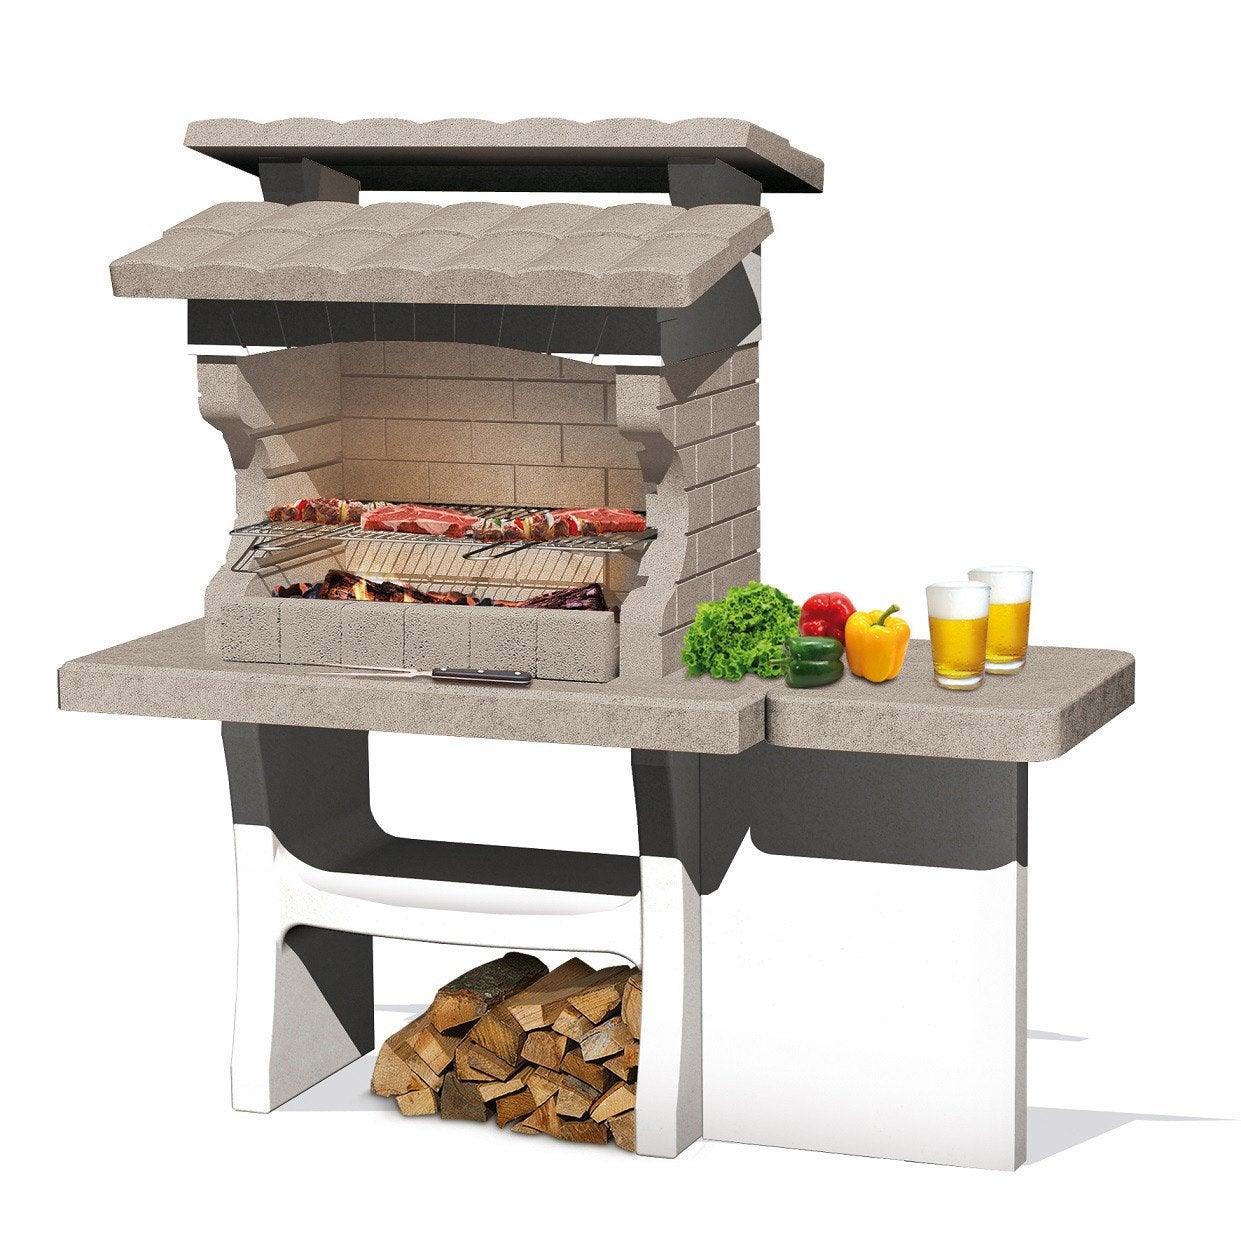 barbecue en b ton beige et gris luxor x x cm leroy merlin. Black Bedroom Furniture Sets. Home Design Ideas